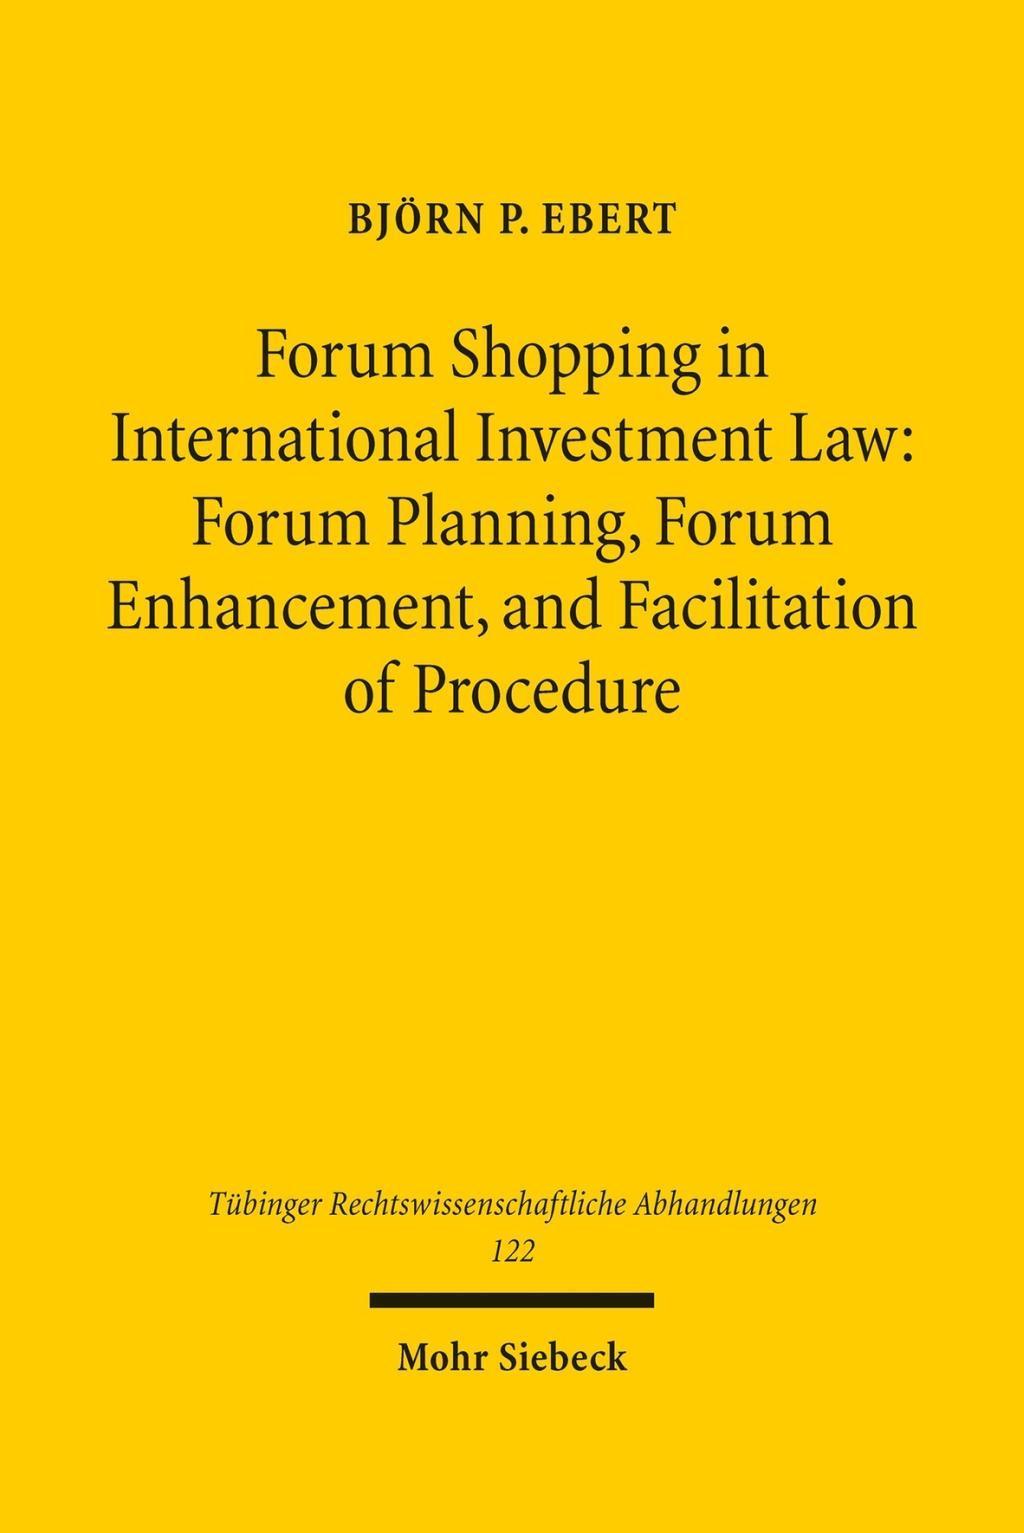 Forum Shopping in International Investment Law: Forum Planning, Forum Enhan ... - Altomünster, Deutschland - Forum Shopping in International Investment Law: Forum Planning, Forum Enhan ... - Altomünster, Deutschland